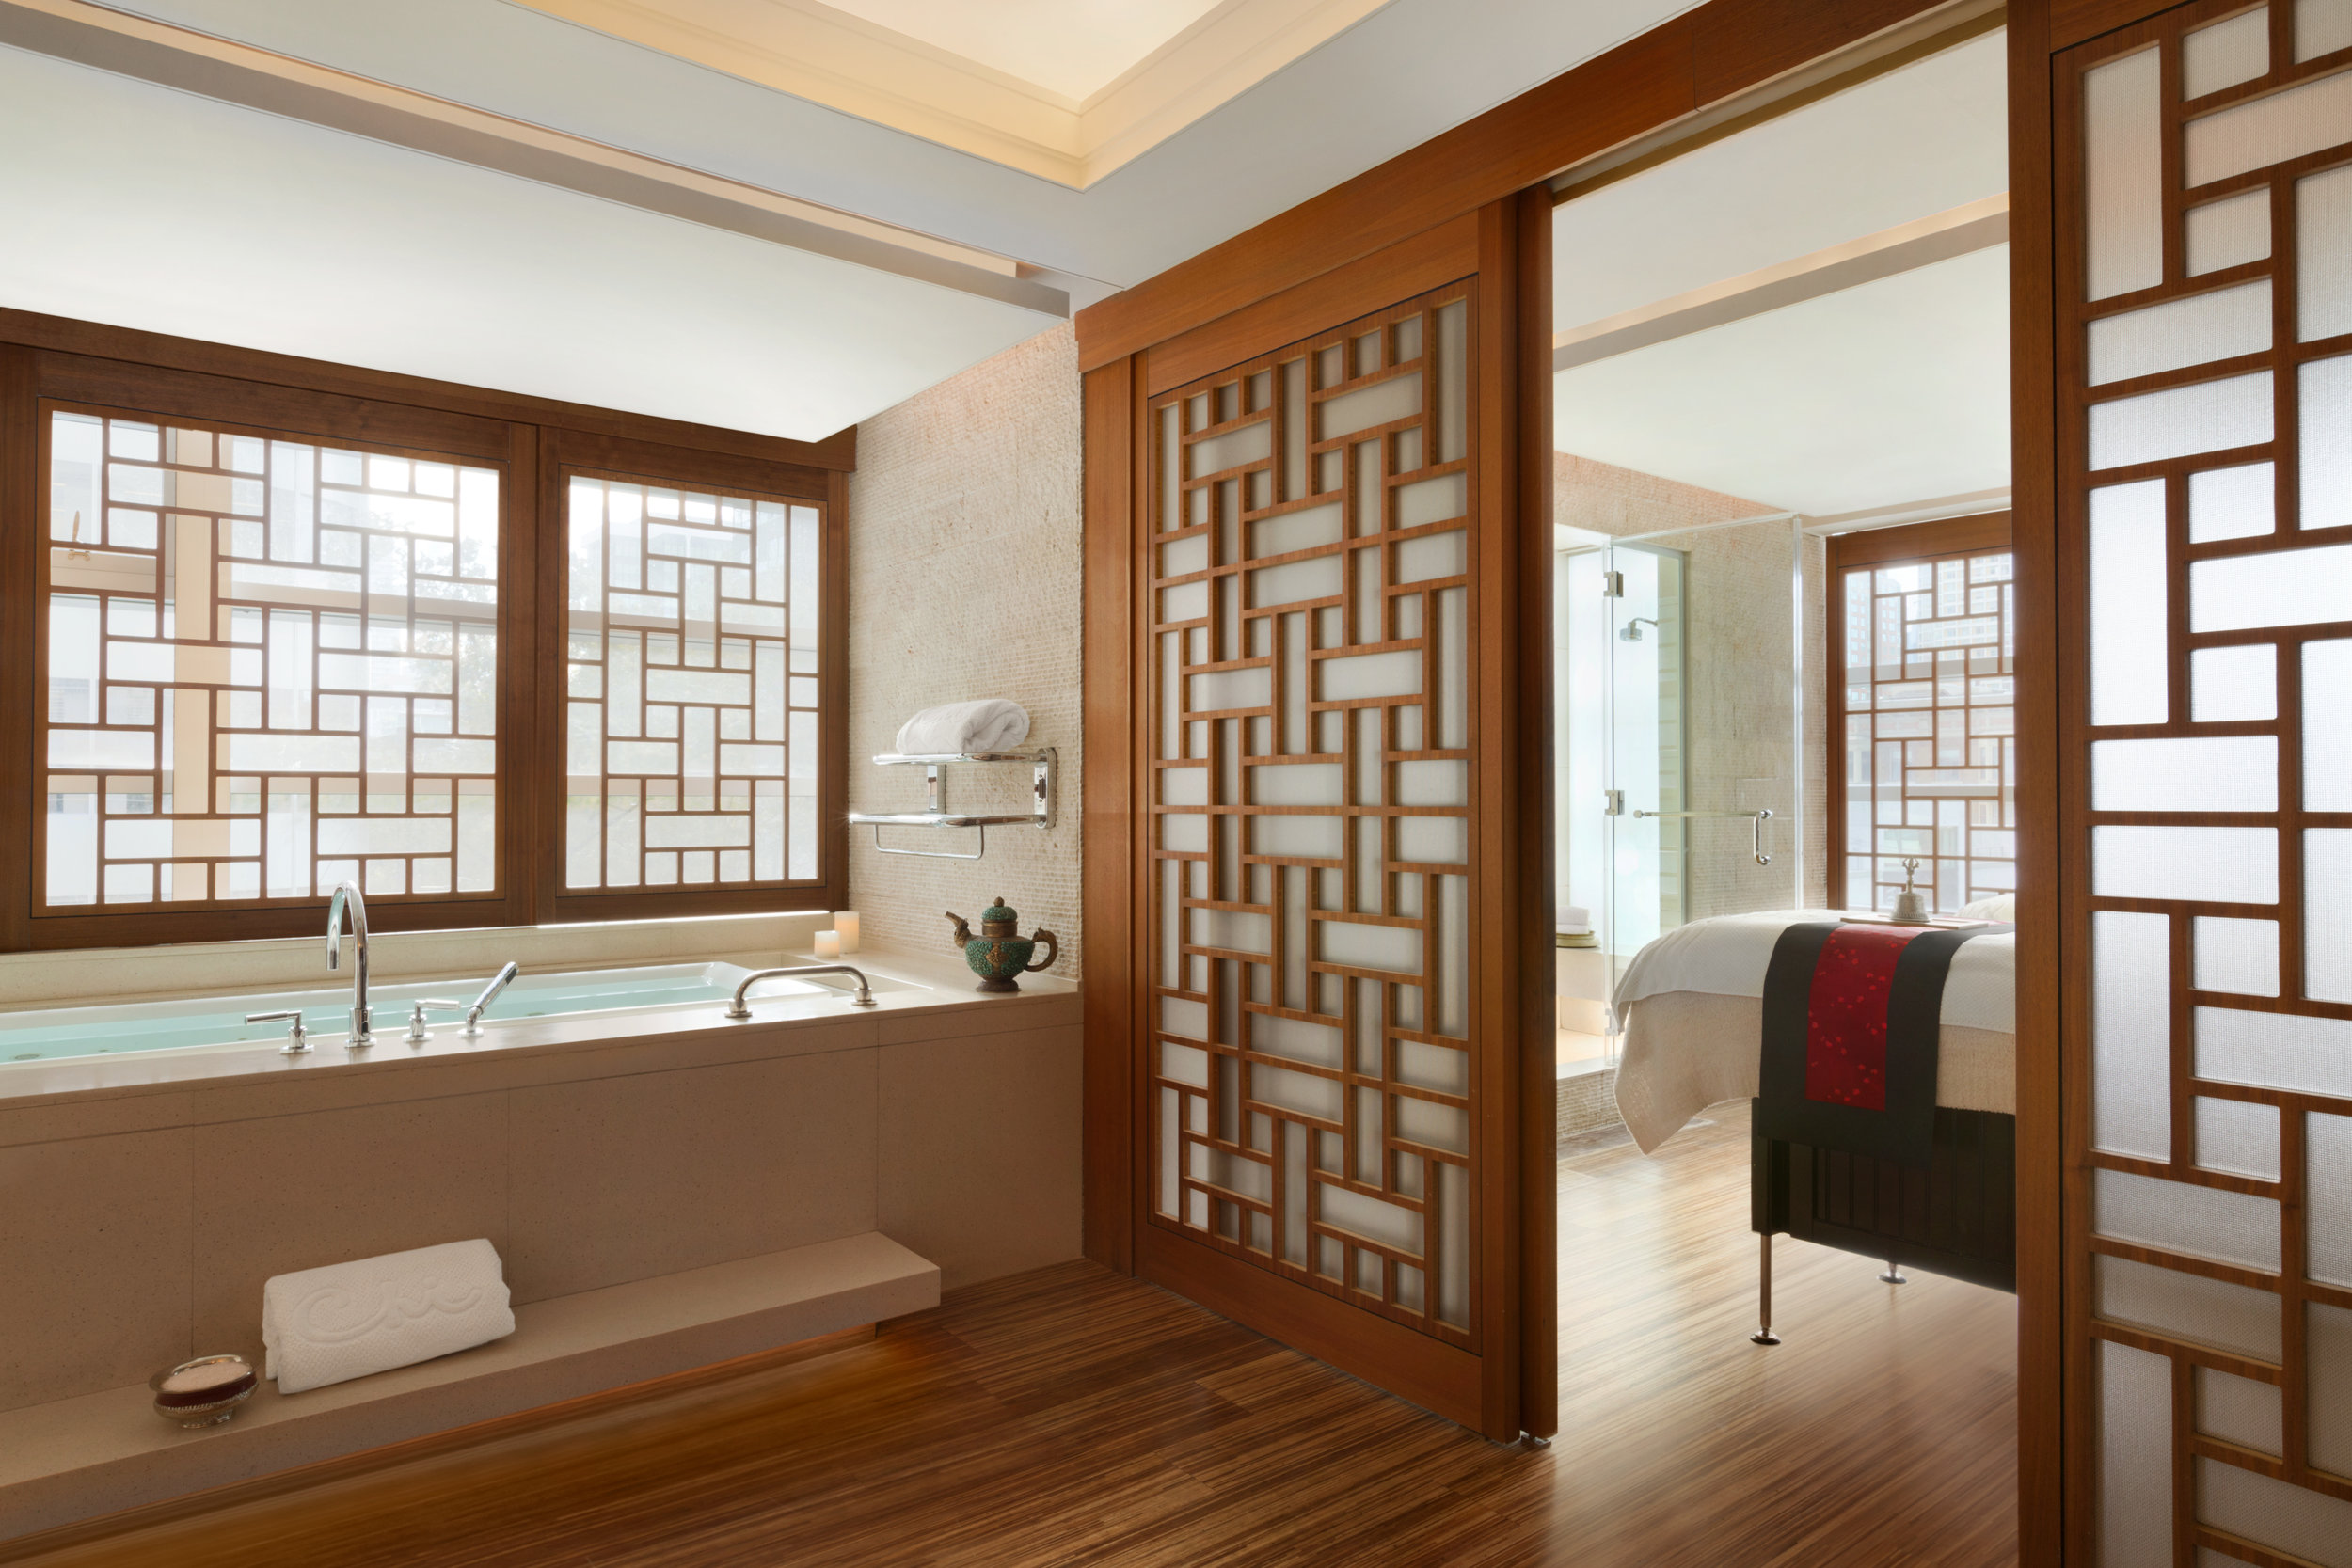 Shangri-La Hotel Vancouver - CHI The Spa - Couples Suite - 1238556.jpg